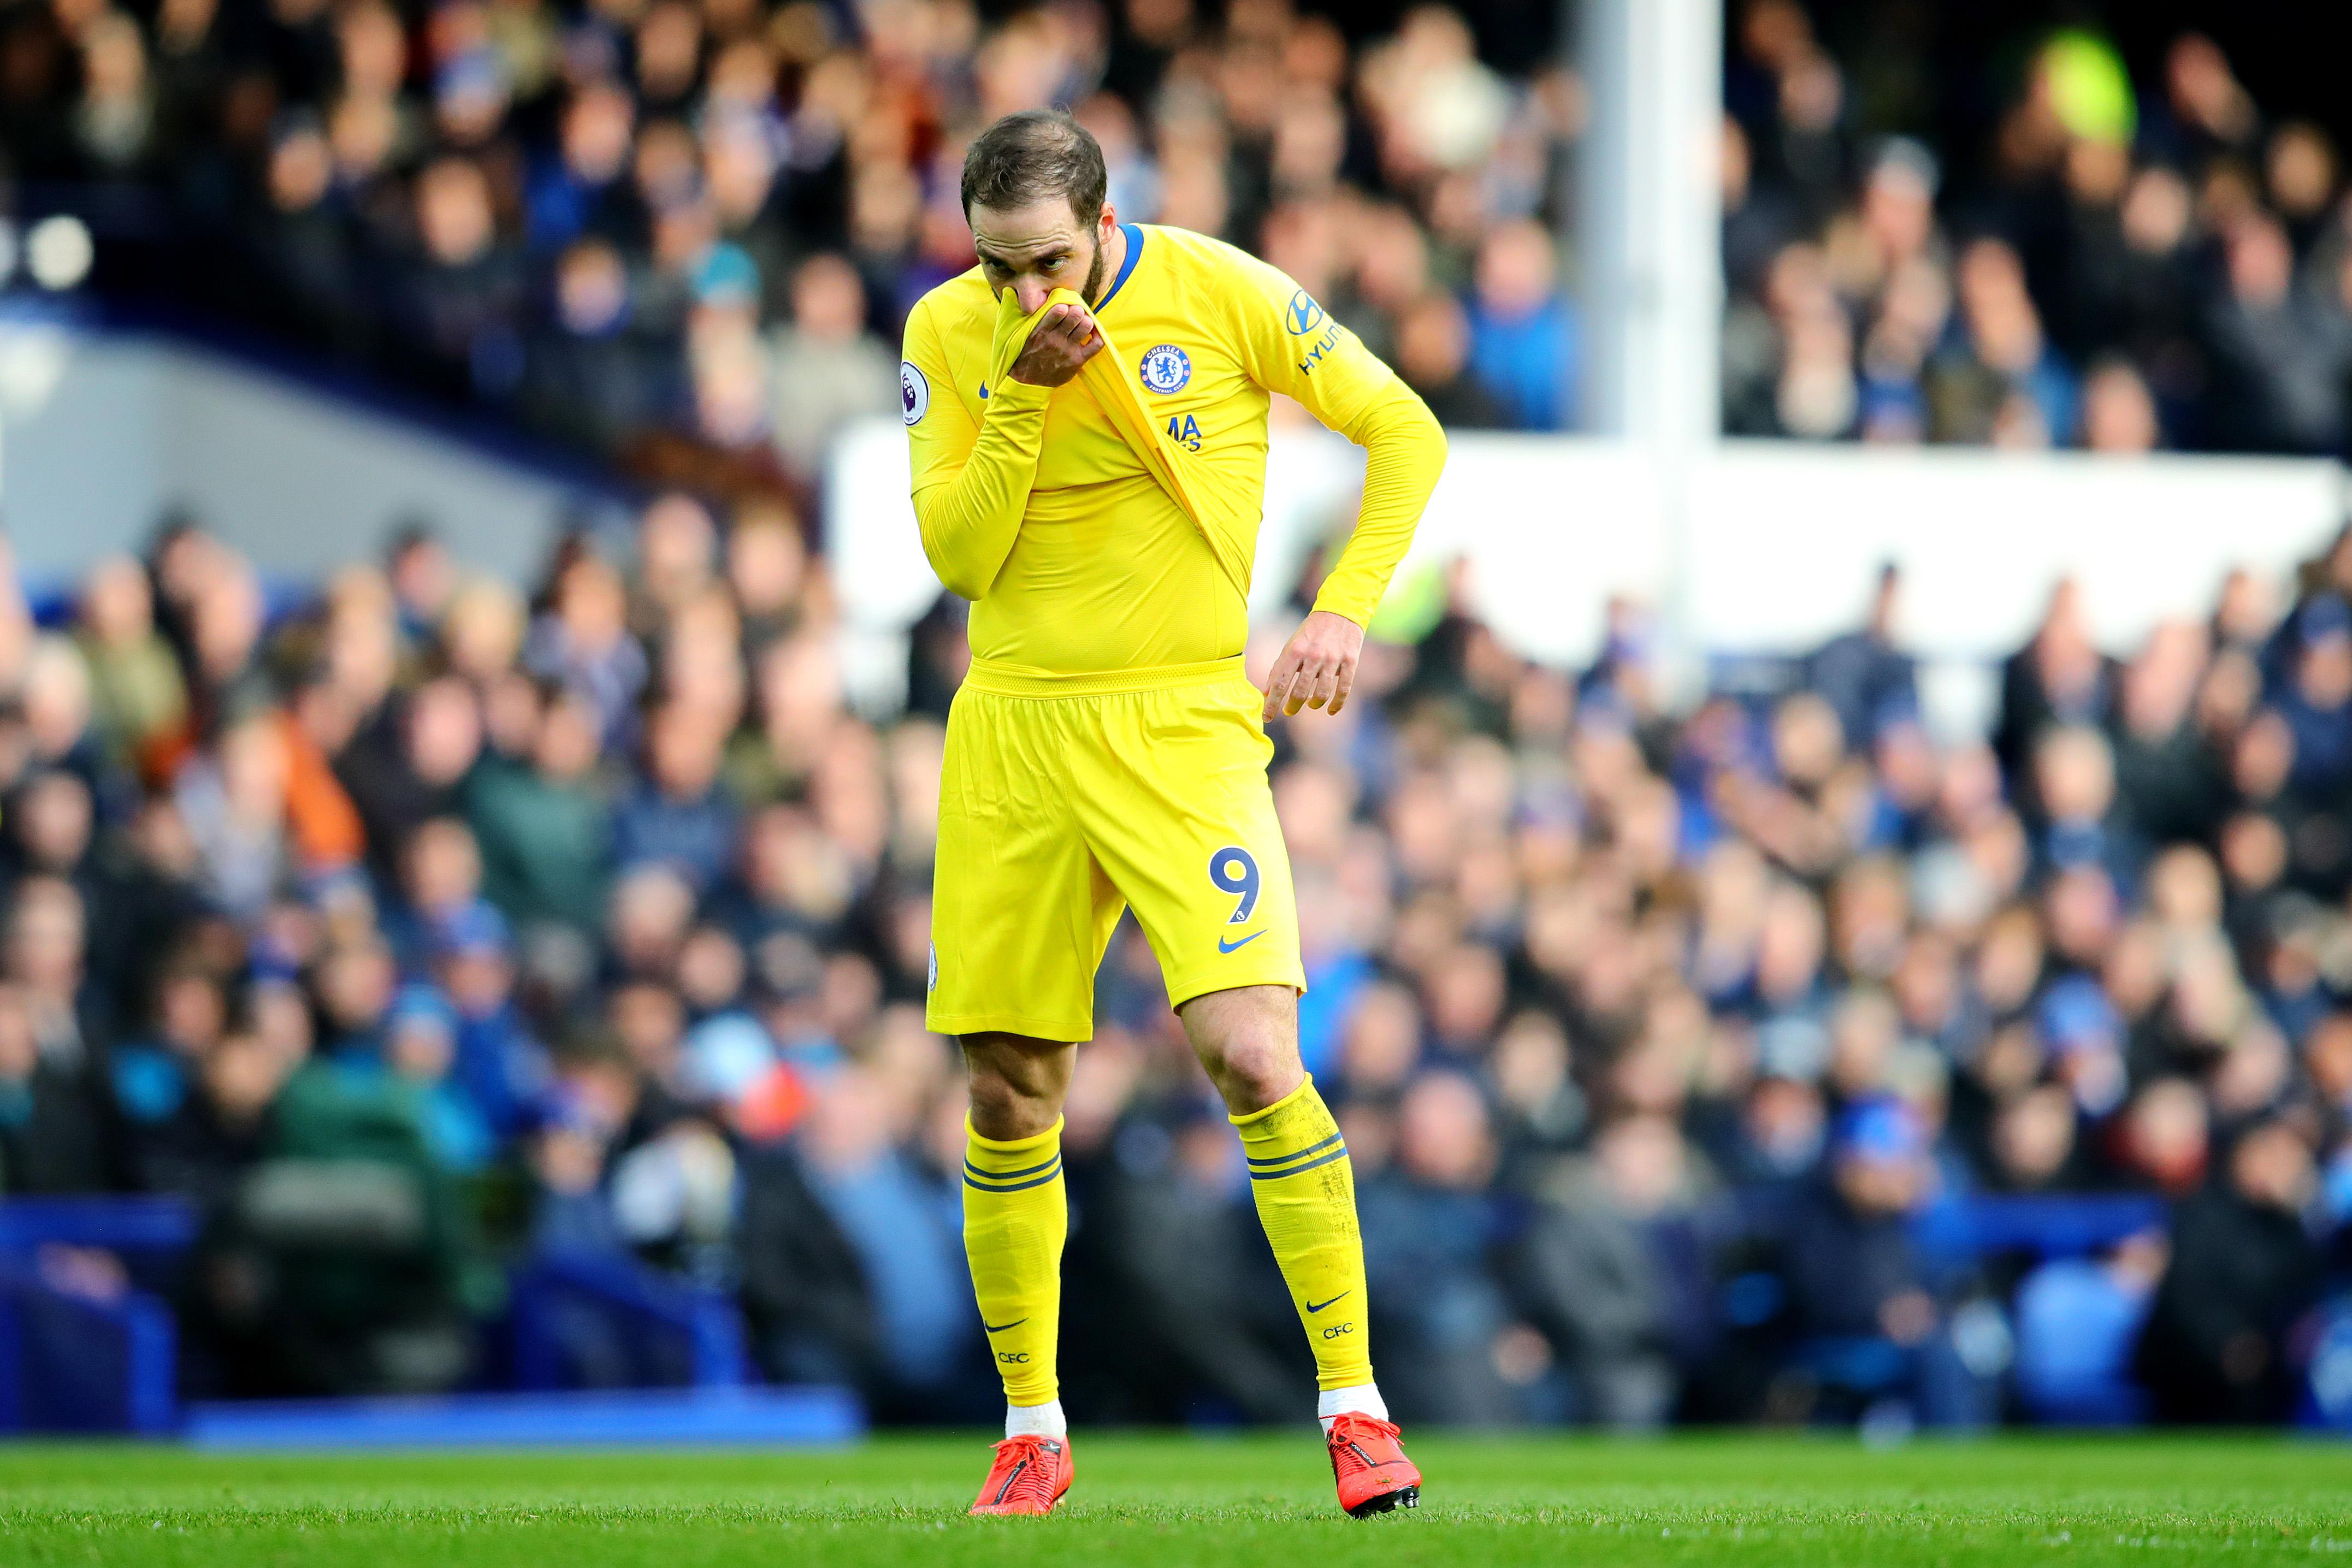 Maurizio Sarri reveals what Gonzalo Higuain has told him about Chelsea struggles